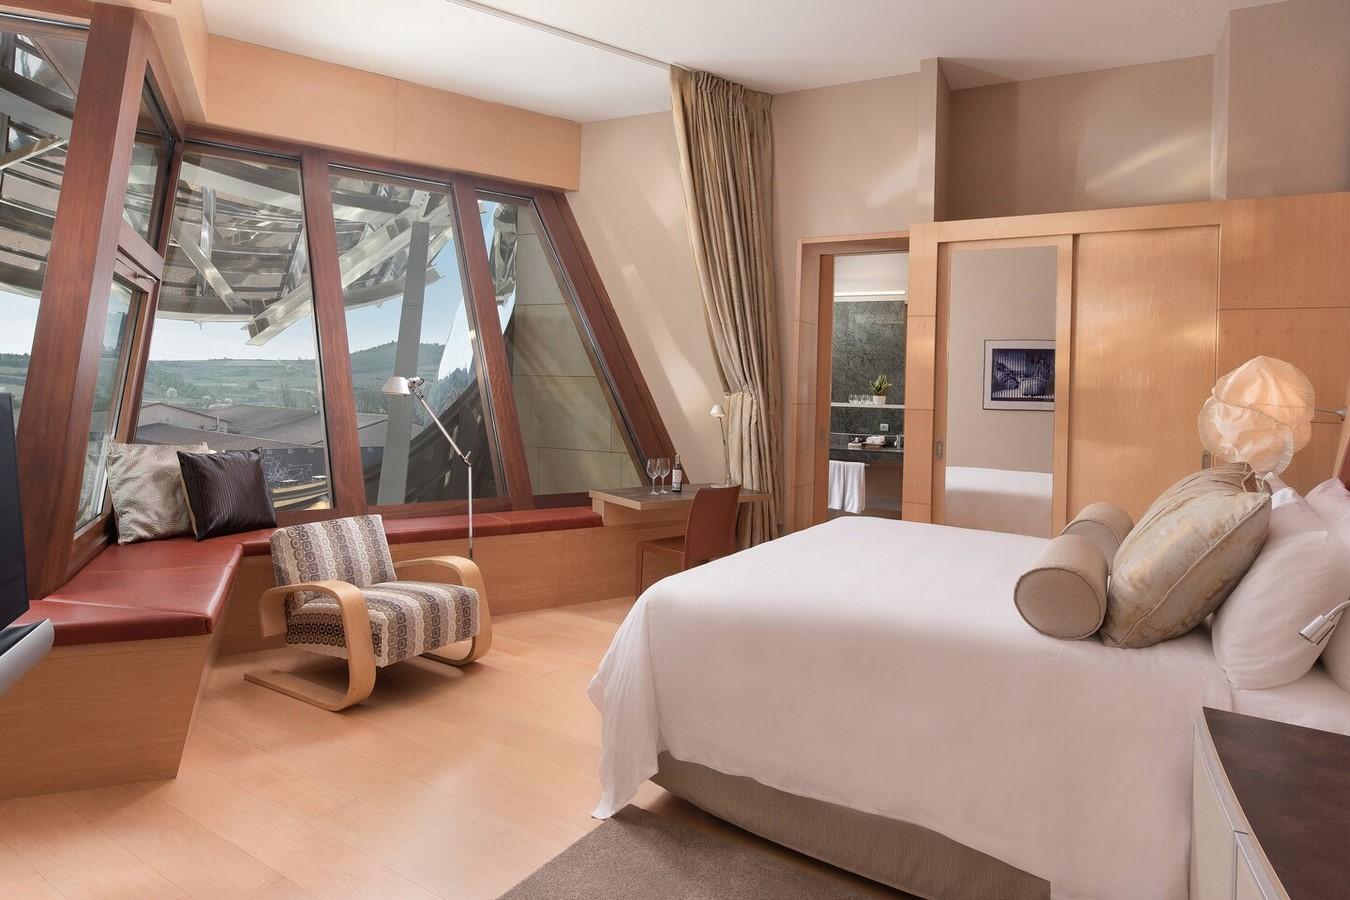 Hotel Marqués de Riscal Spain by Frank Gehry: Vintage experiences through Modern Approach - Sheet12